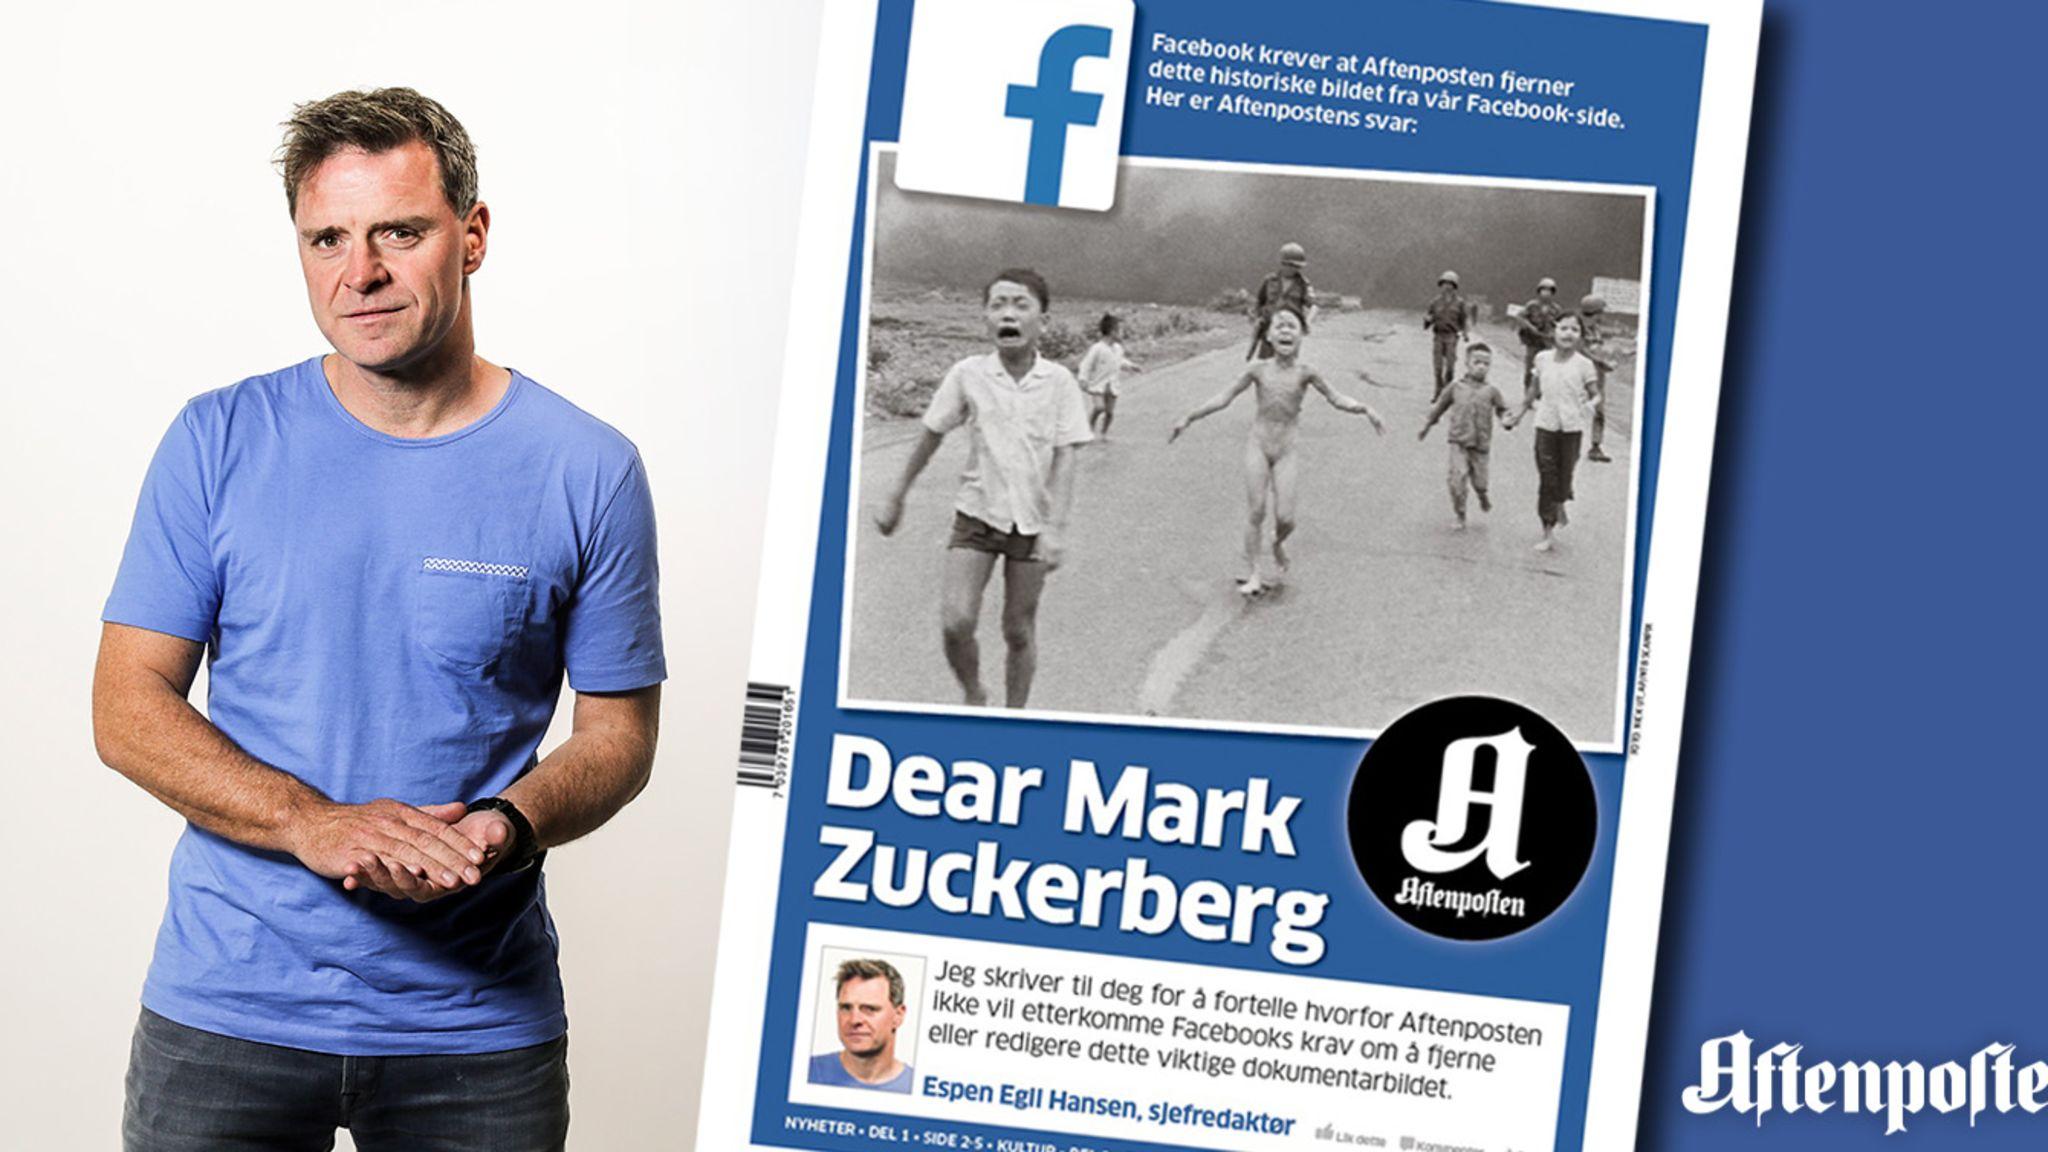 #DearMark: How Aftenposten stood up against Facebook